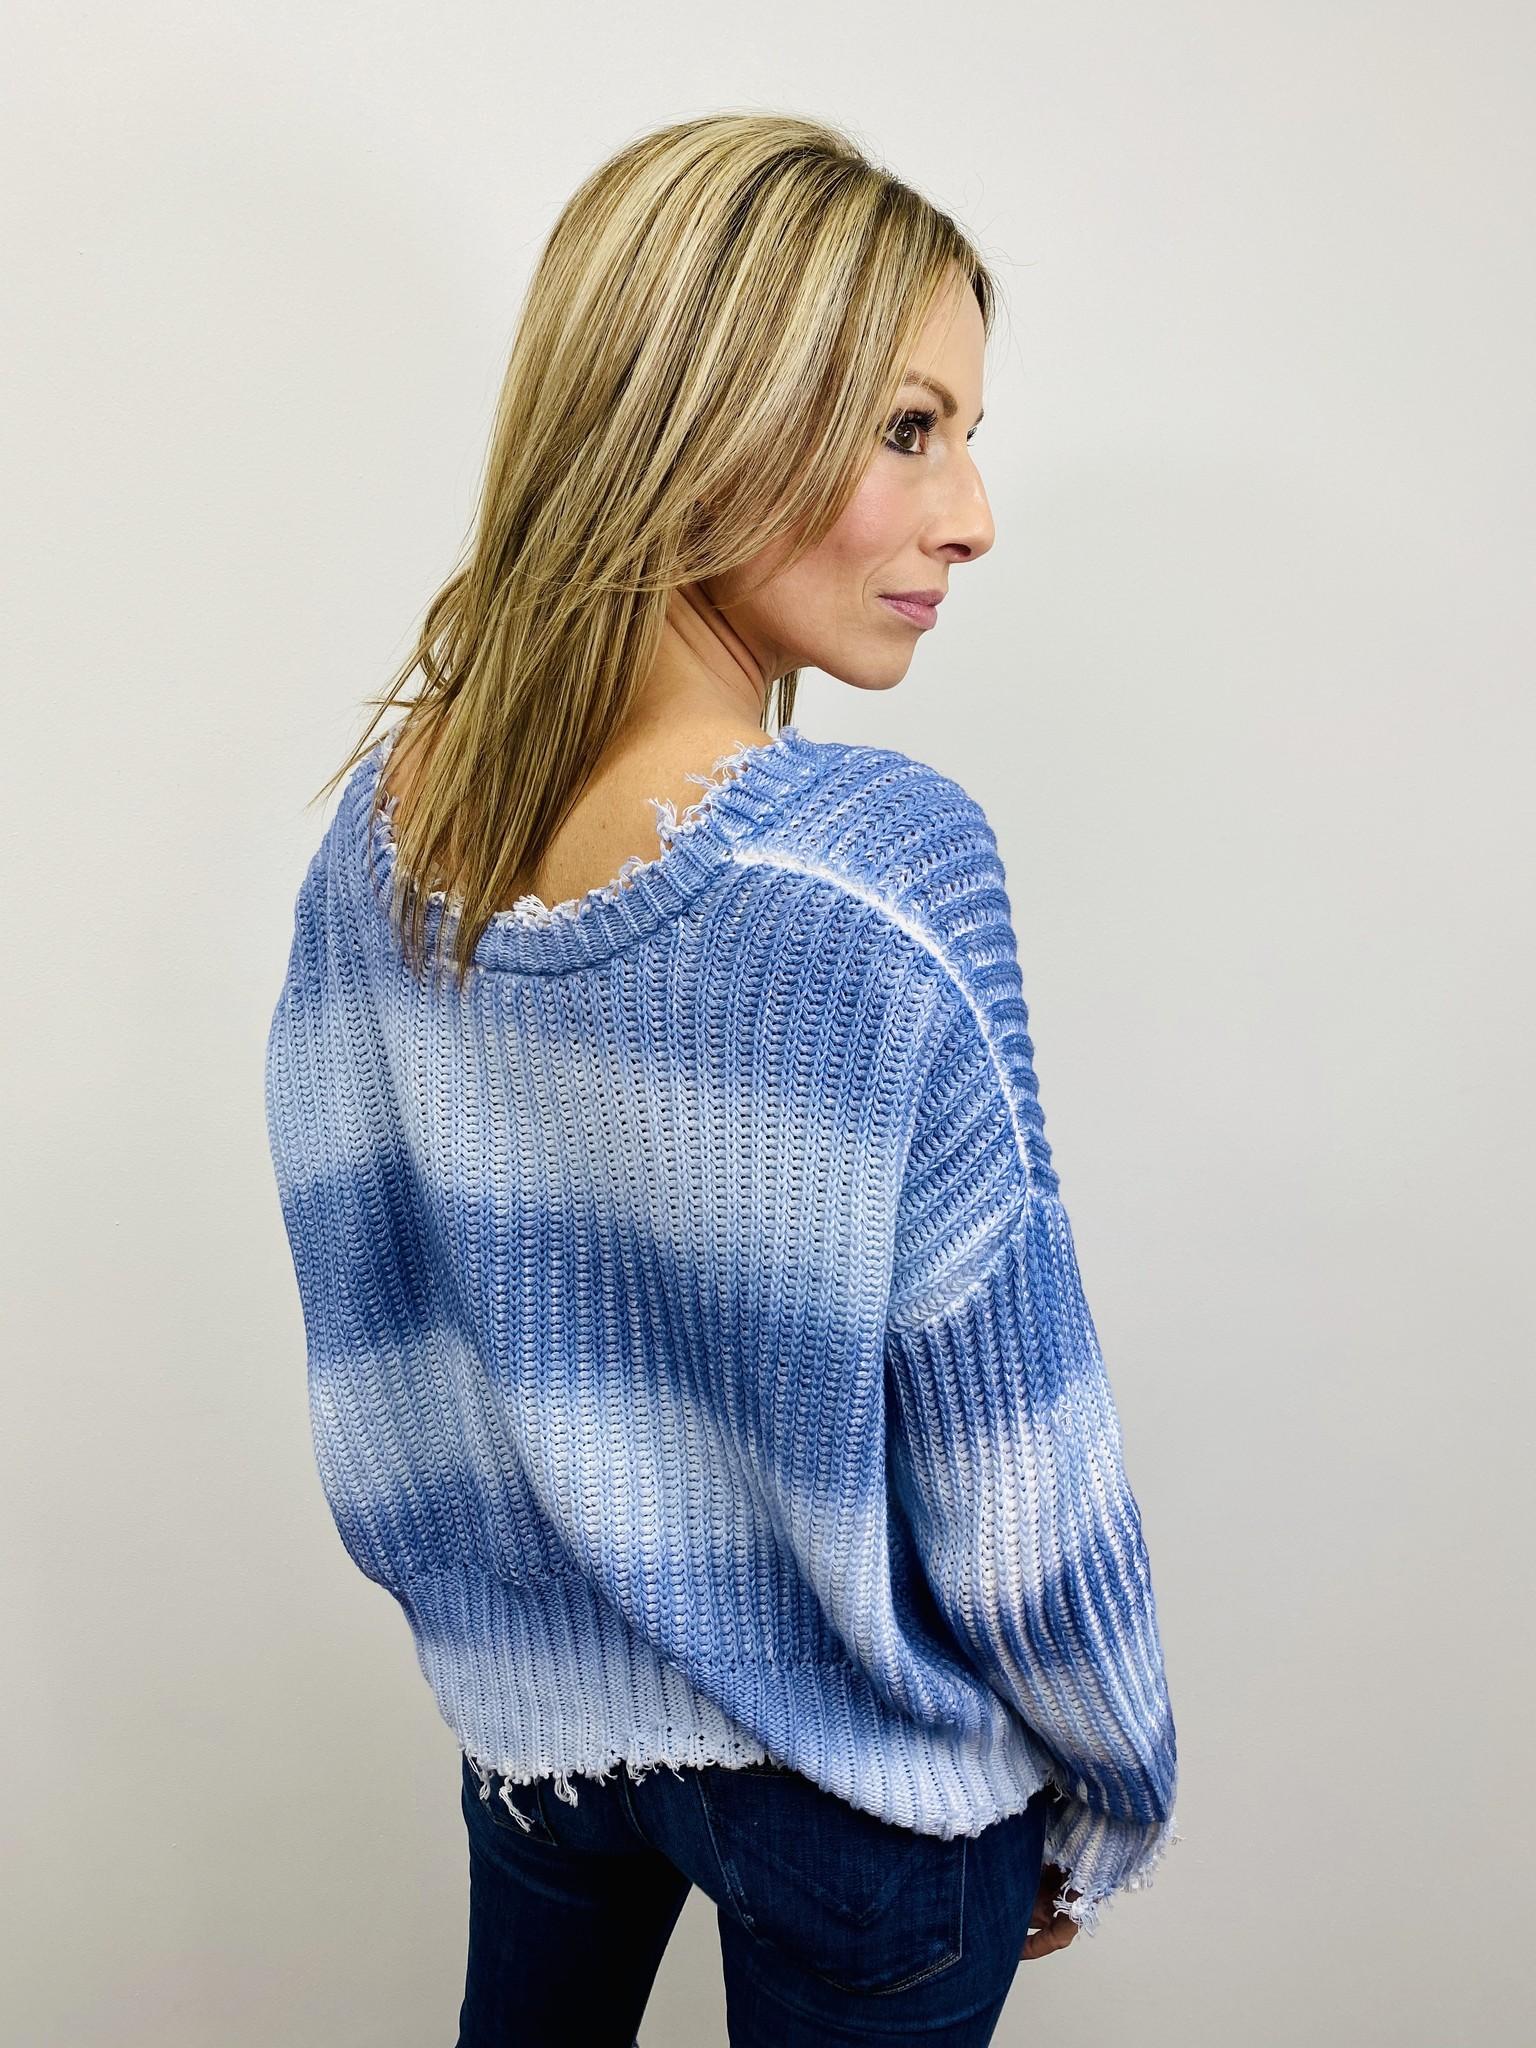 White Crow Catarina Sweater in Blue Heron